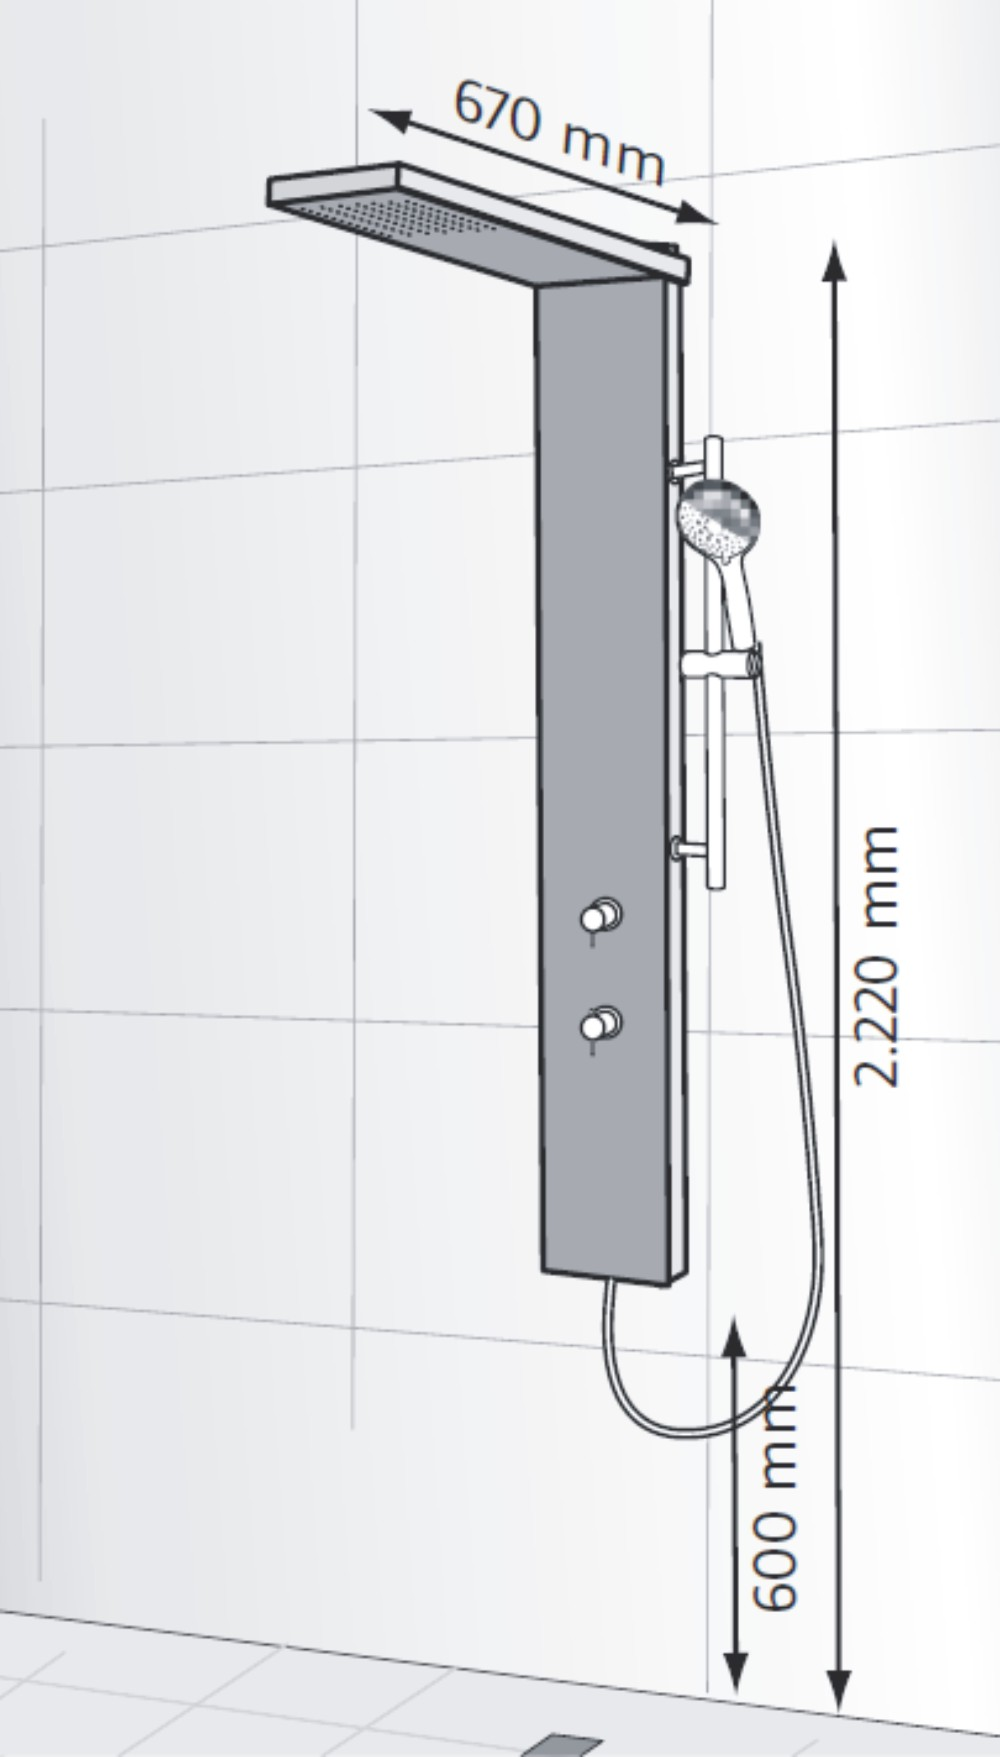 duschpaneel ohne thermostat edelstahl duschpaneel. Black Bedroom Furniture Sets. Home Design Ideas